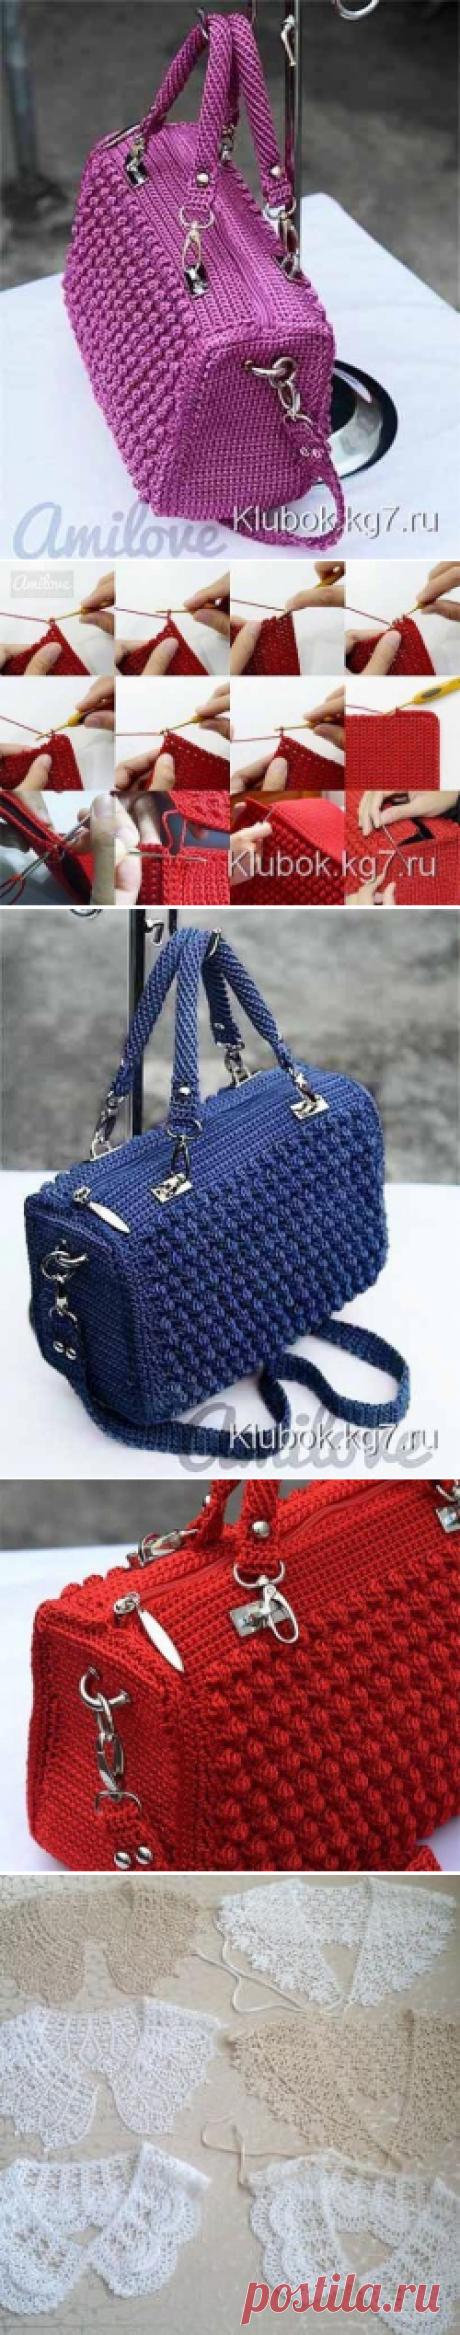 BEAUTIFUL LADIES' HANDBAG (Knitting by a hook) | Inspiration of the Needlewoman Magazine